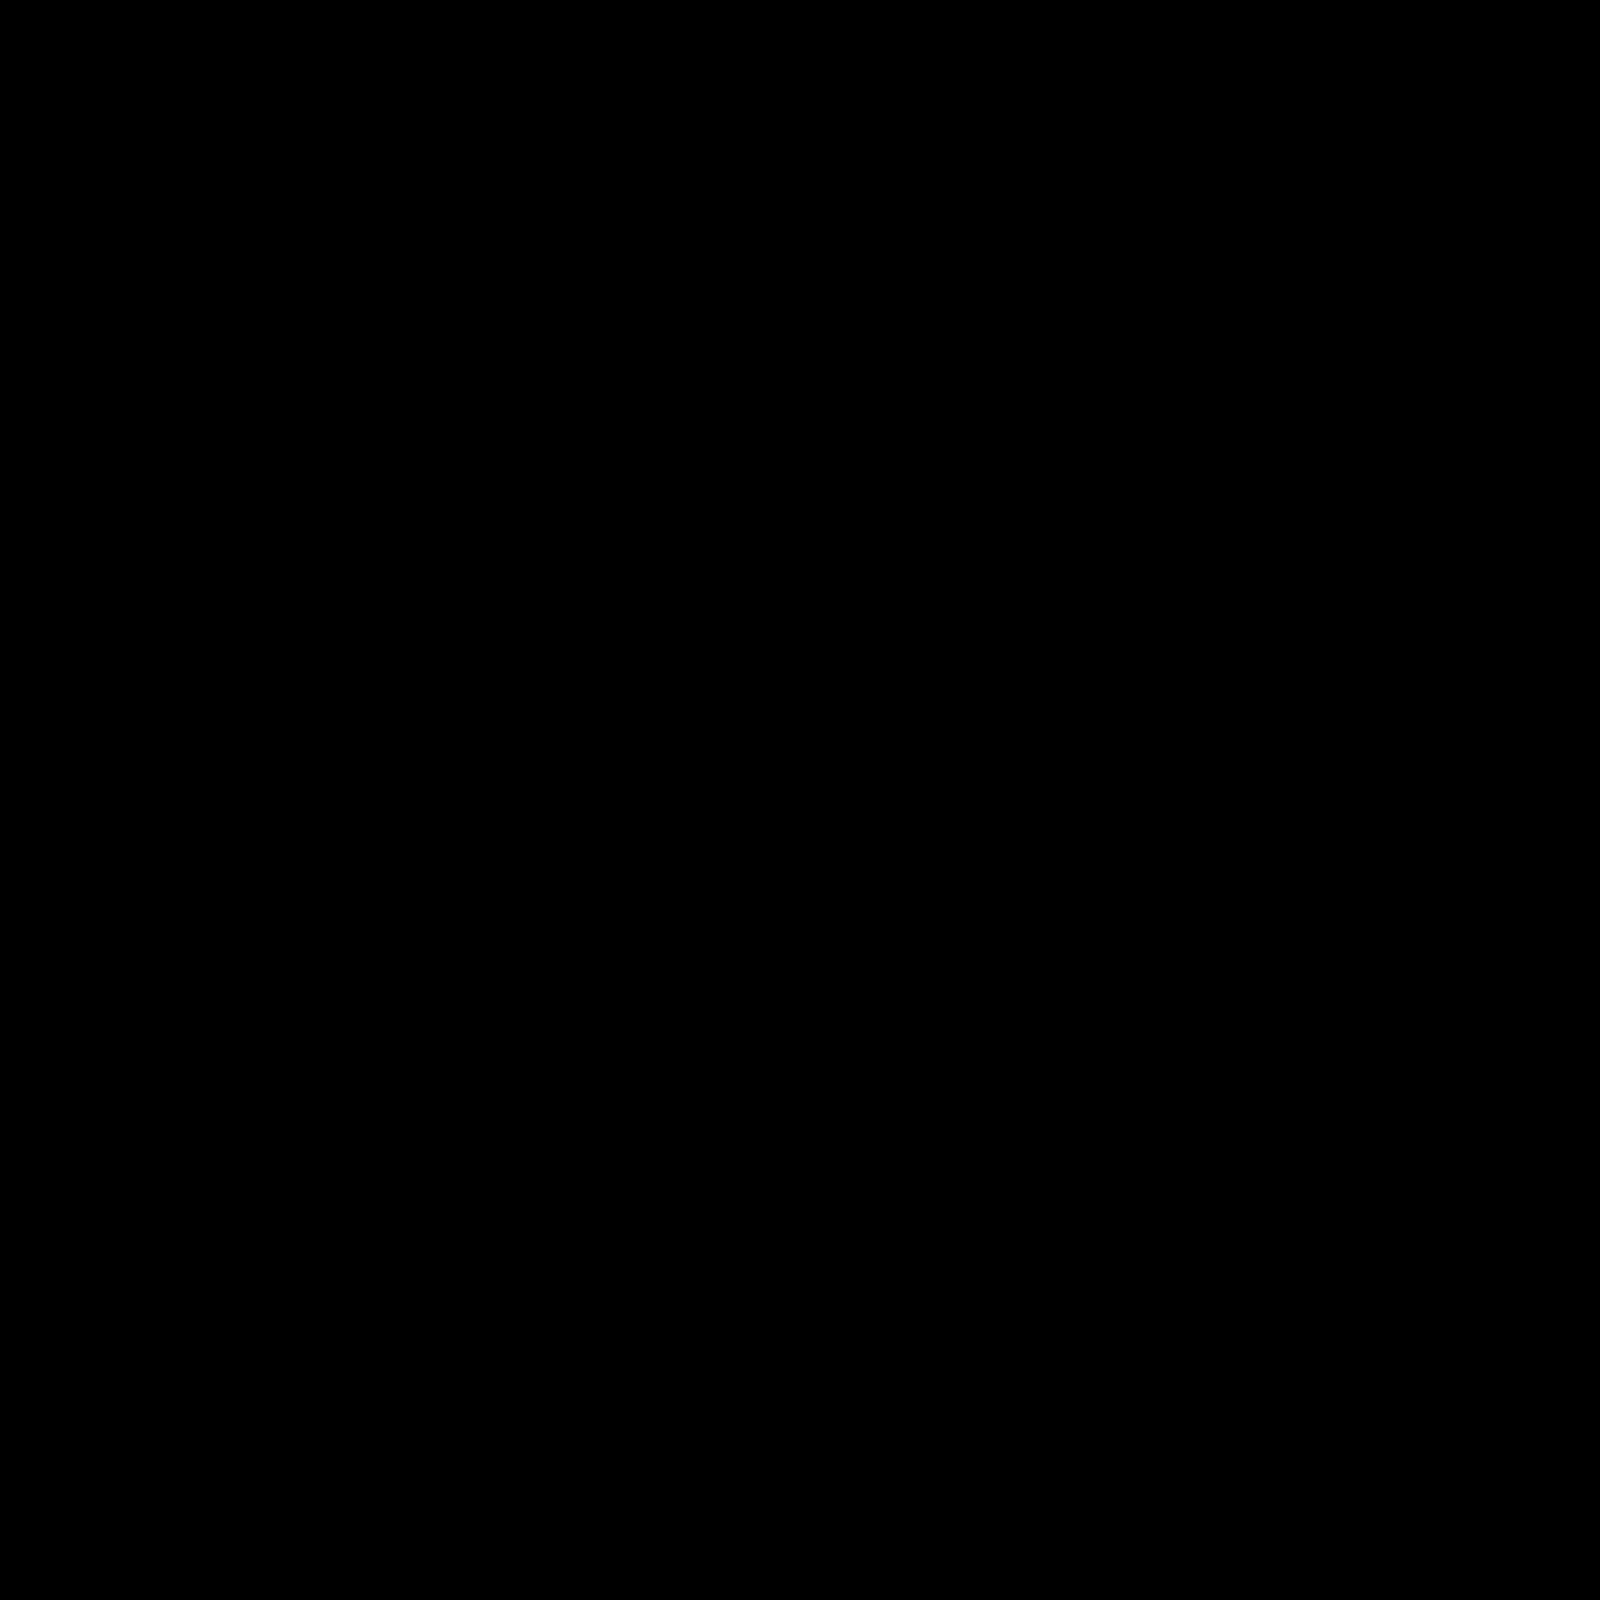 Nurse Male Filled icon